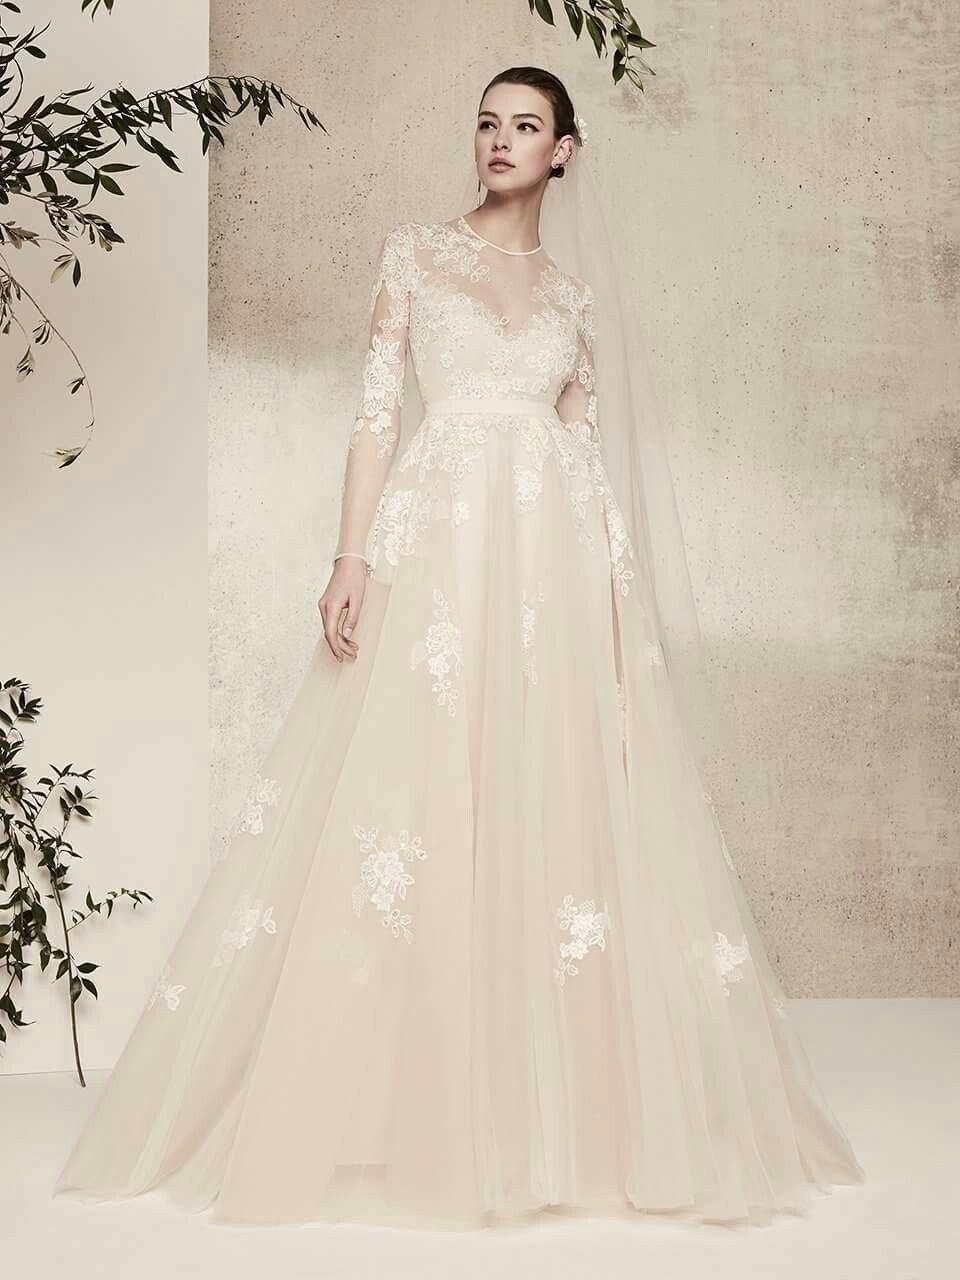 Elie Saab Bridal Spring 2018 Elie Saab Bridal Elie Saab Wedding Dress Wedding Dress Inspiration